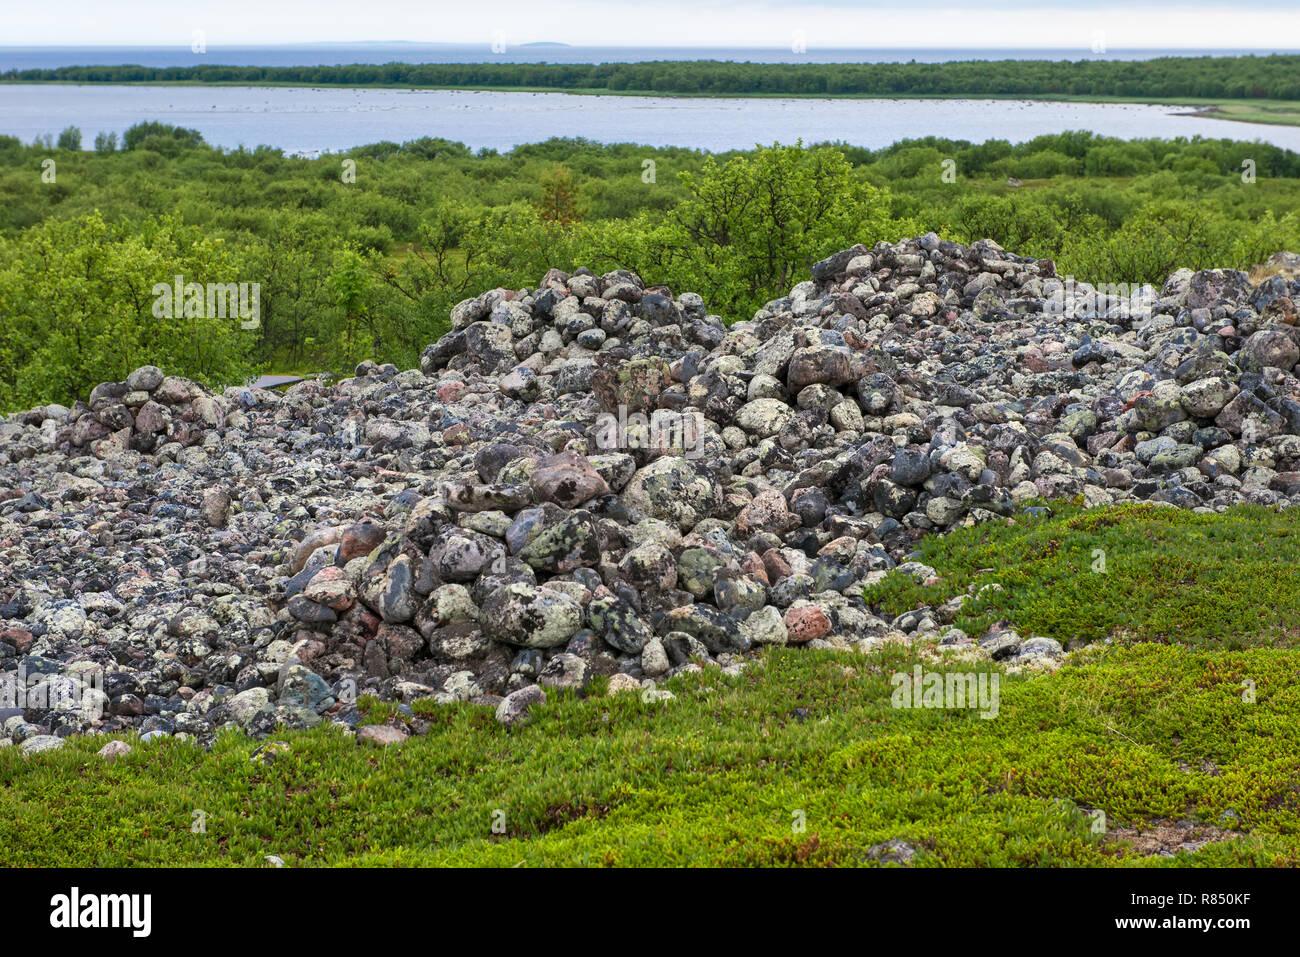 Stone mounds - artificial stone mounds of small boulders on the Bolshoy Zayatsky Island. Solovetsky archipelago, White sea, Russia - Stock Image